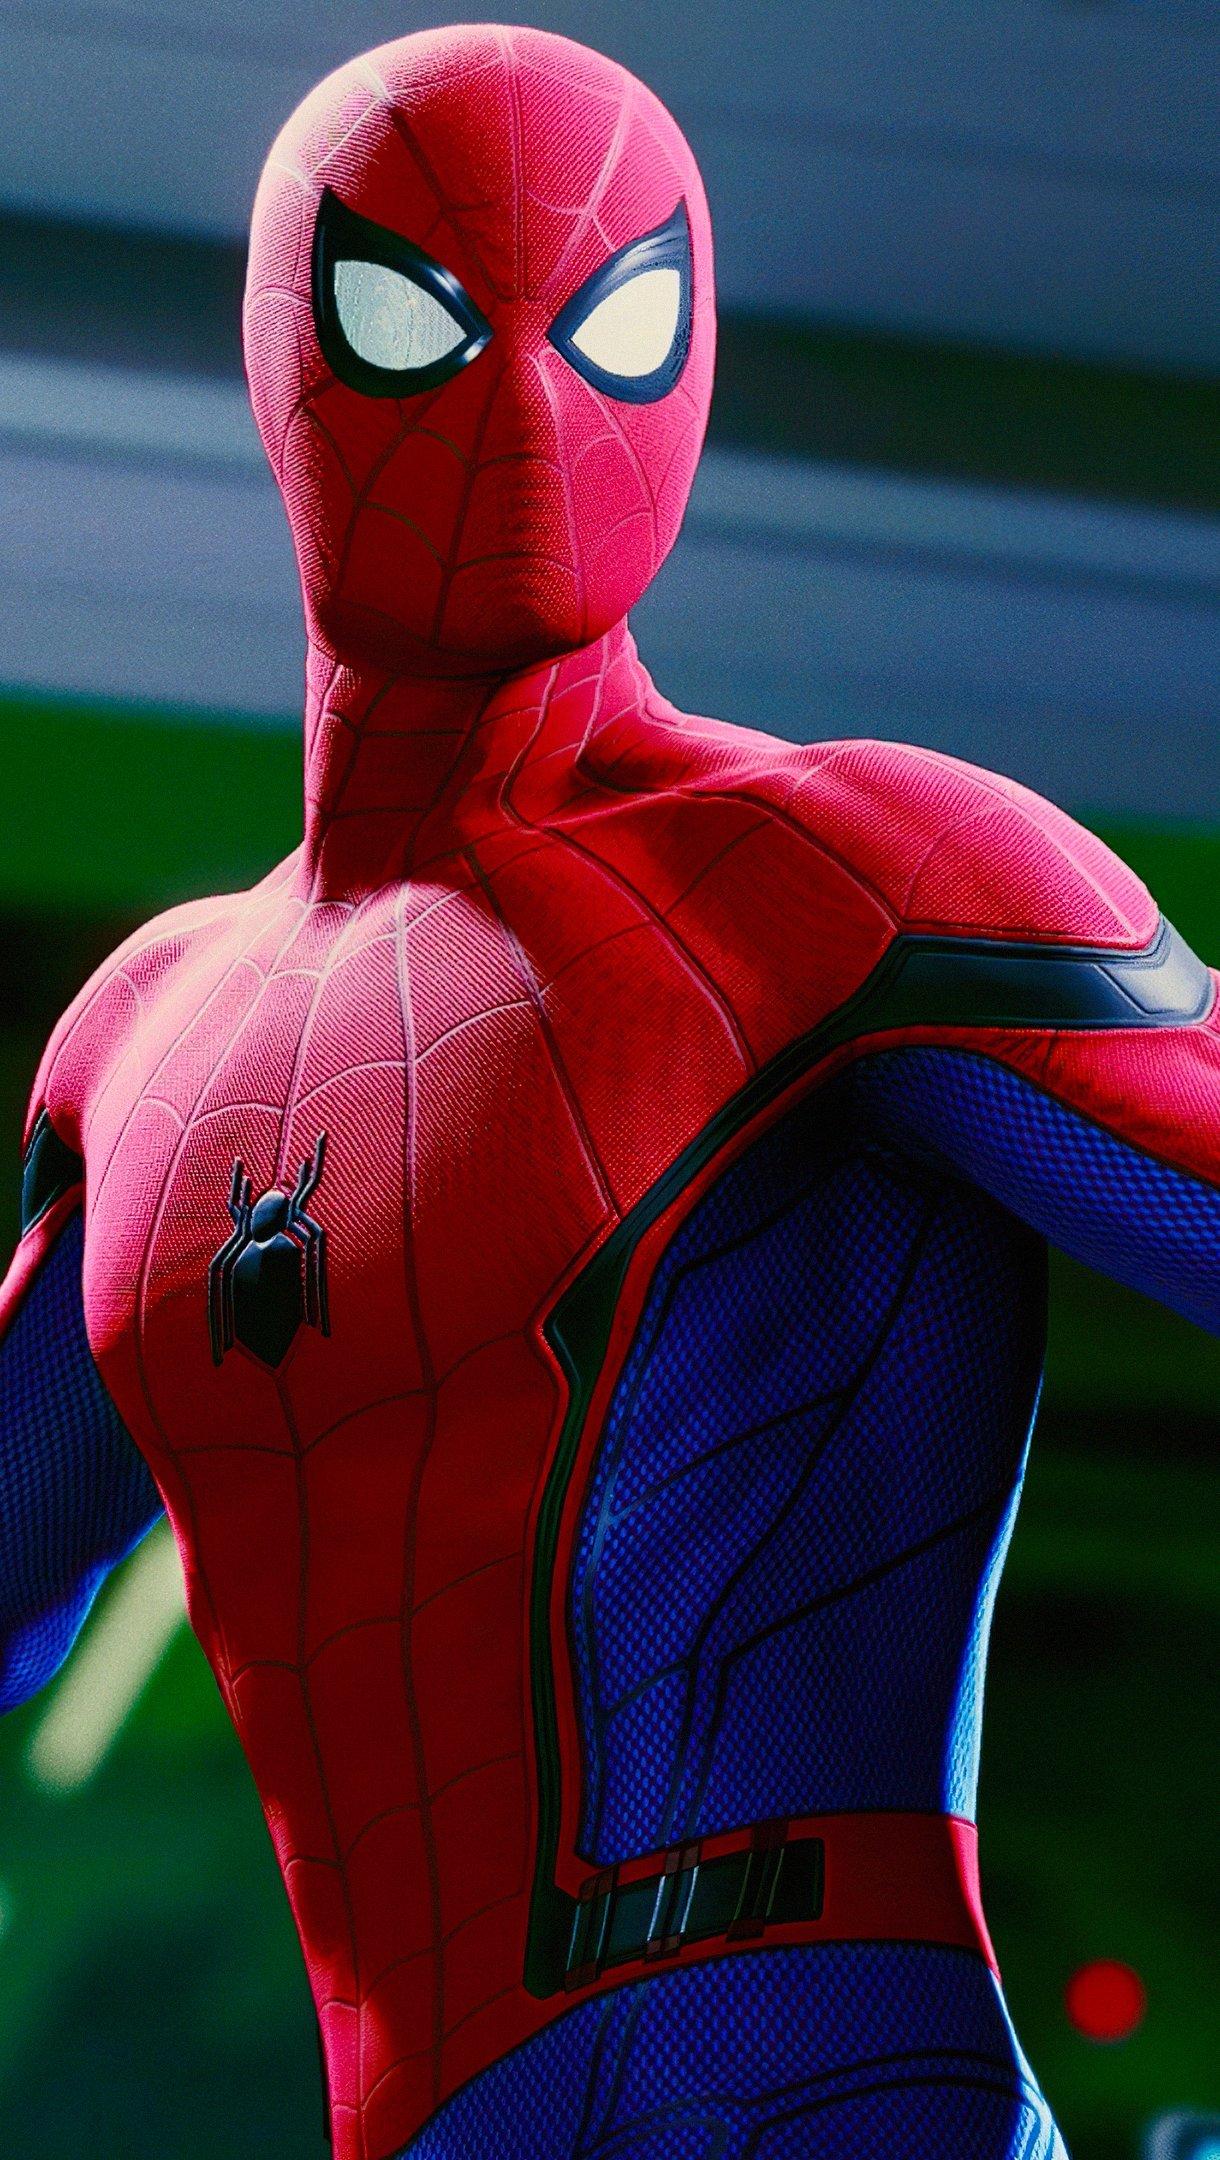 Fondos de pantalla El hombre araña: De regreso a casa Vertical